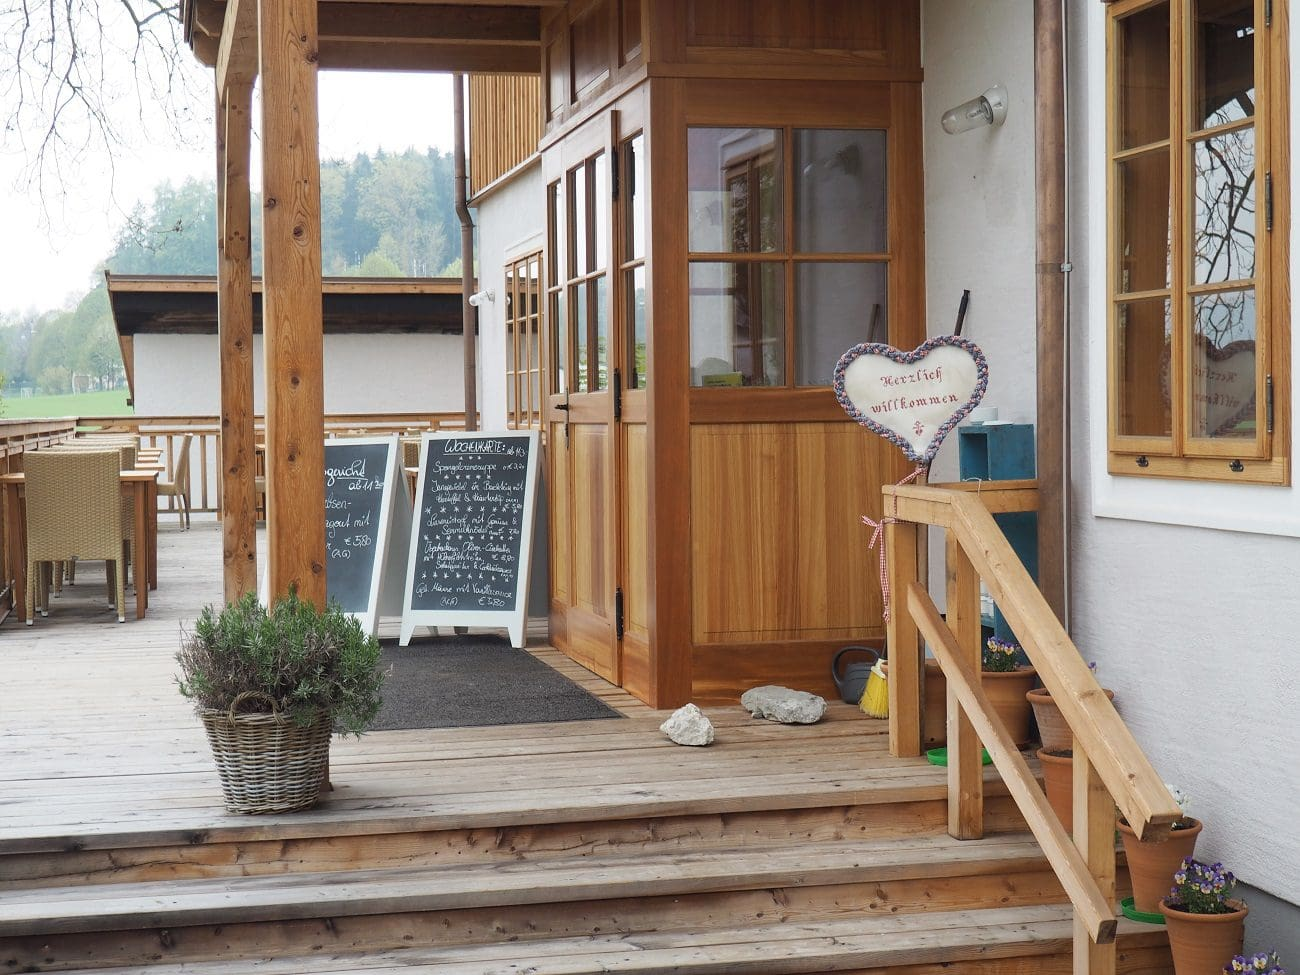 Attersee Experience – Café Bandlkramerey